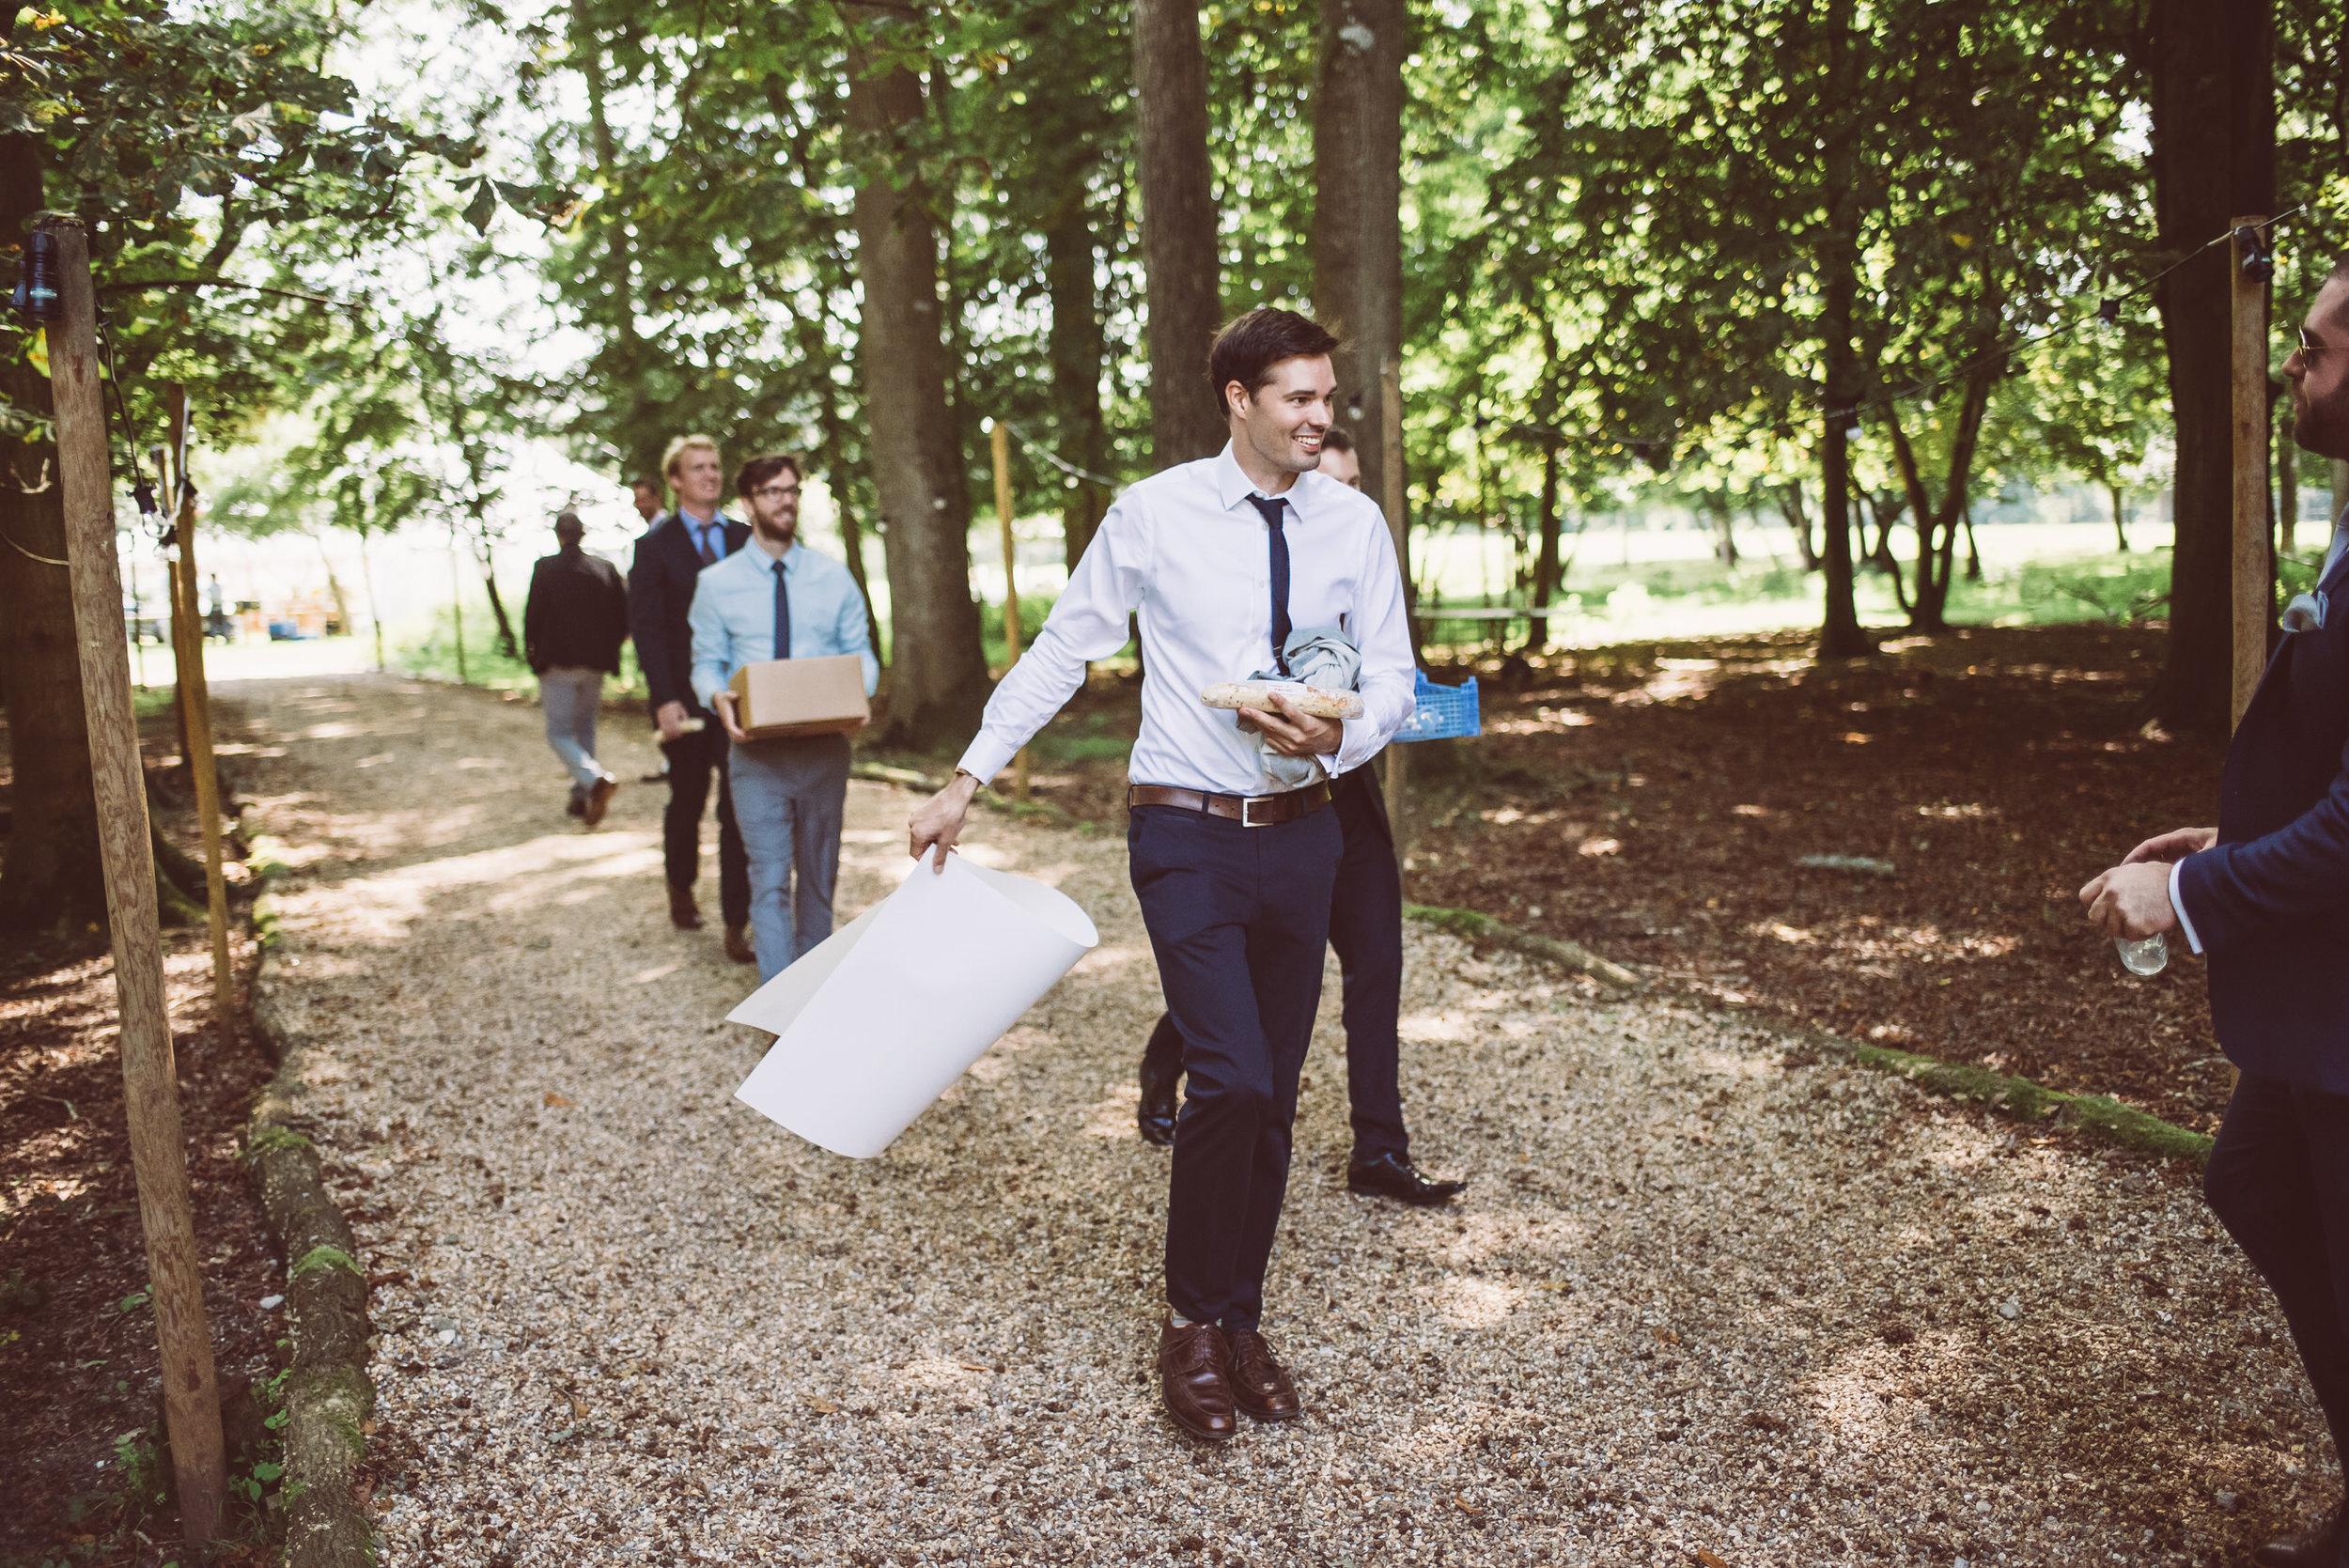 knepp-castle-boho-outdoor-wedding-25.jpg